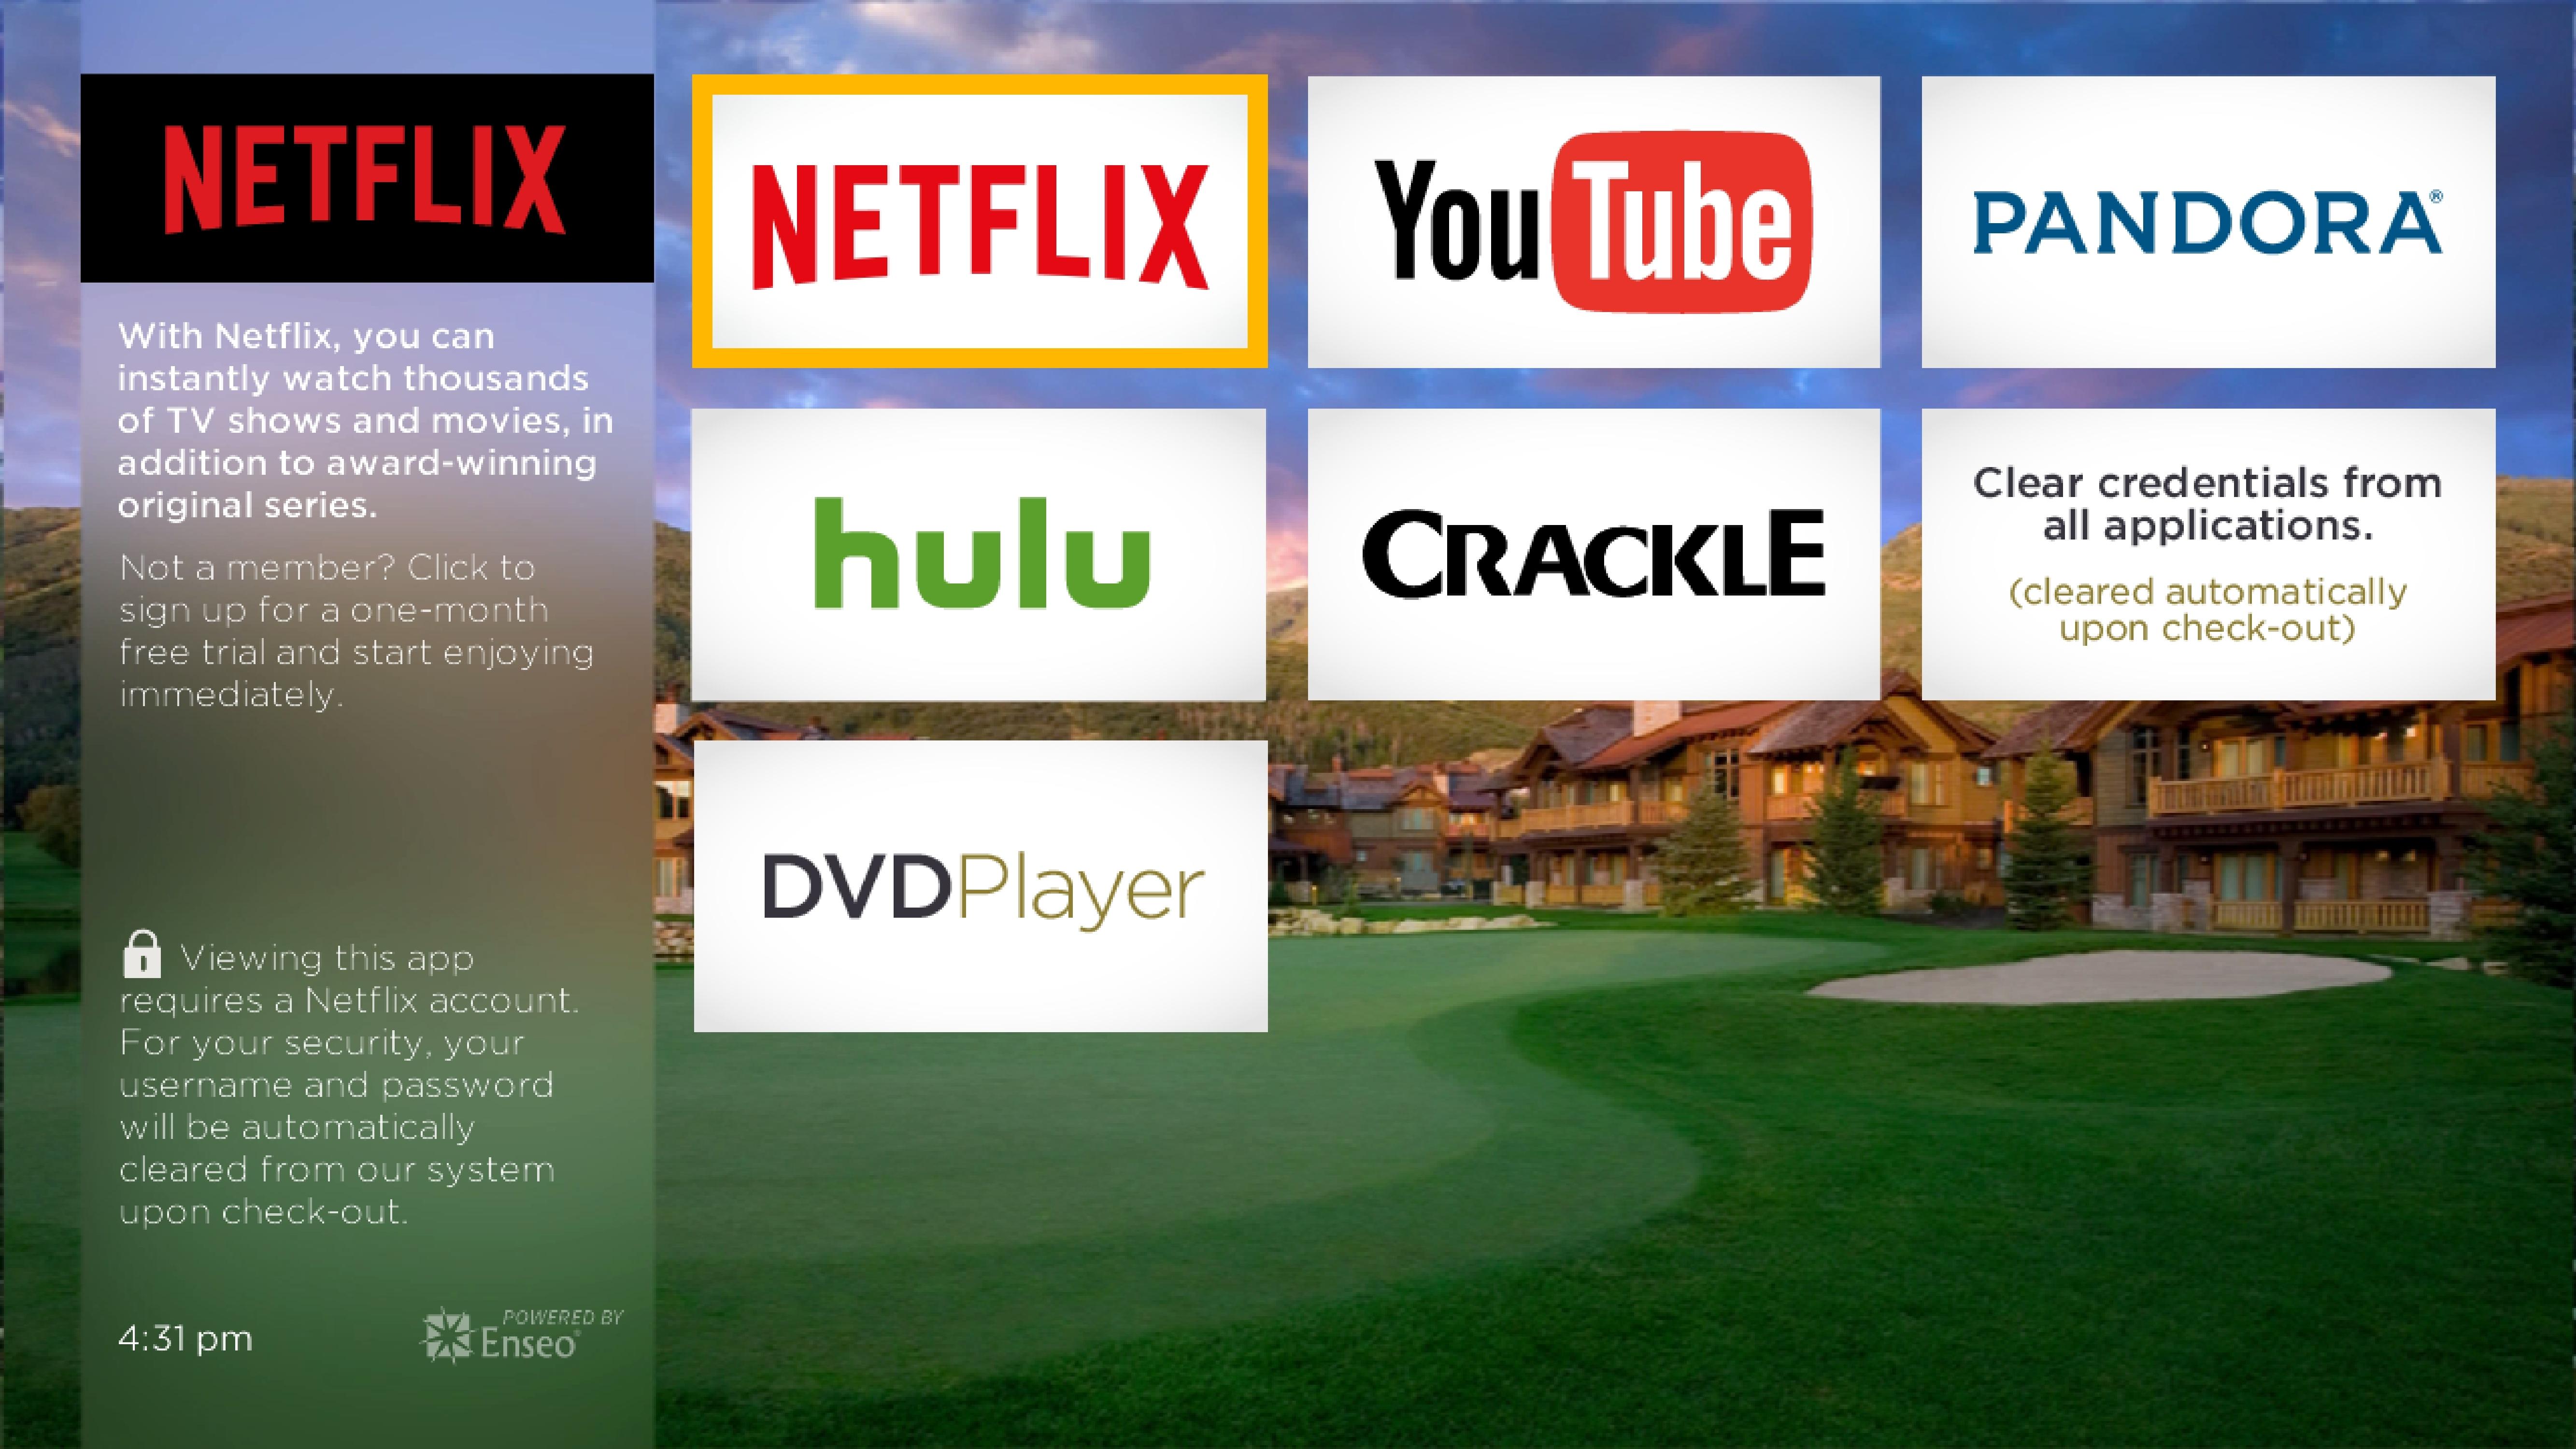 Netflix expands hospitality offering through expanded enseo netflix expands hospitality offering through expanded enseo agreement business wire platinumwayz